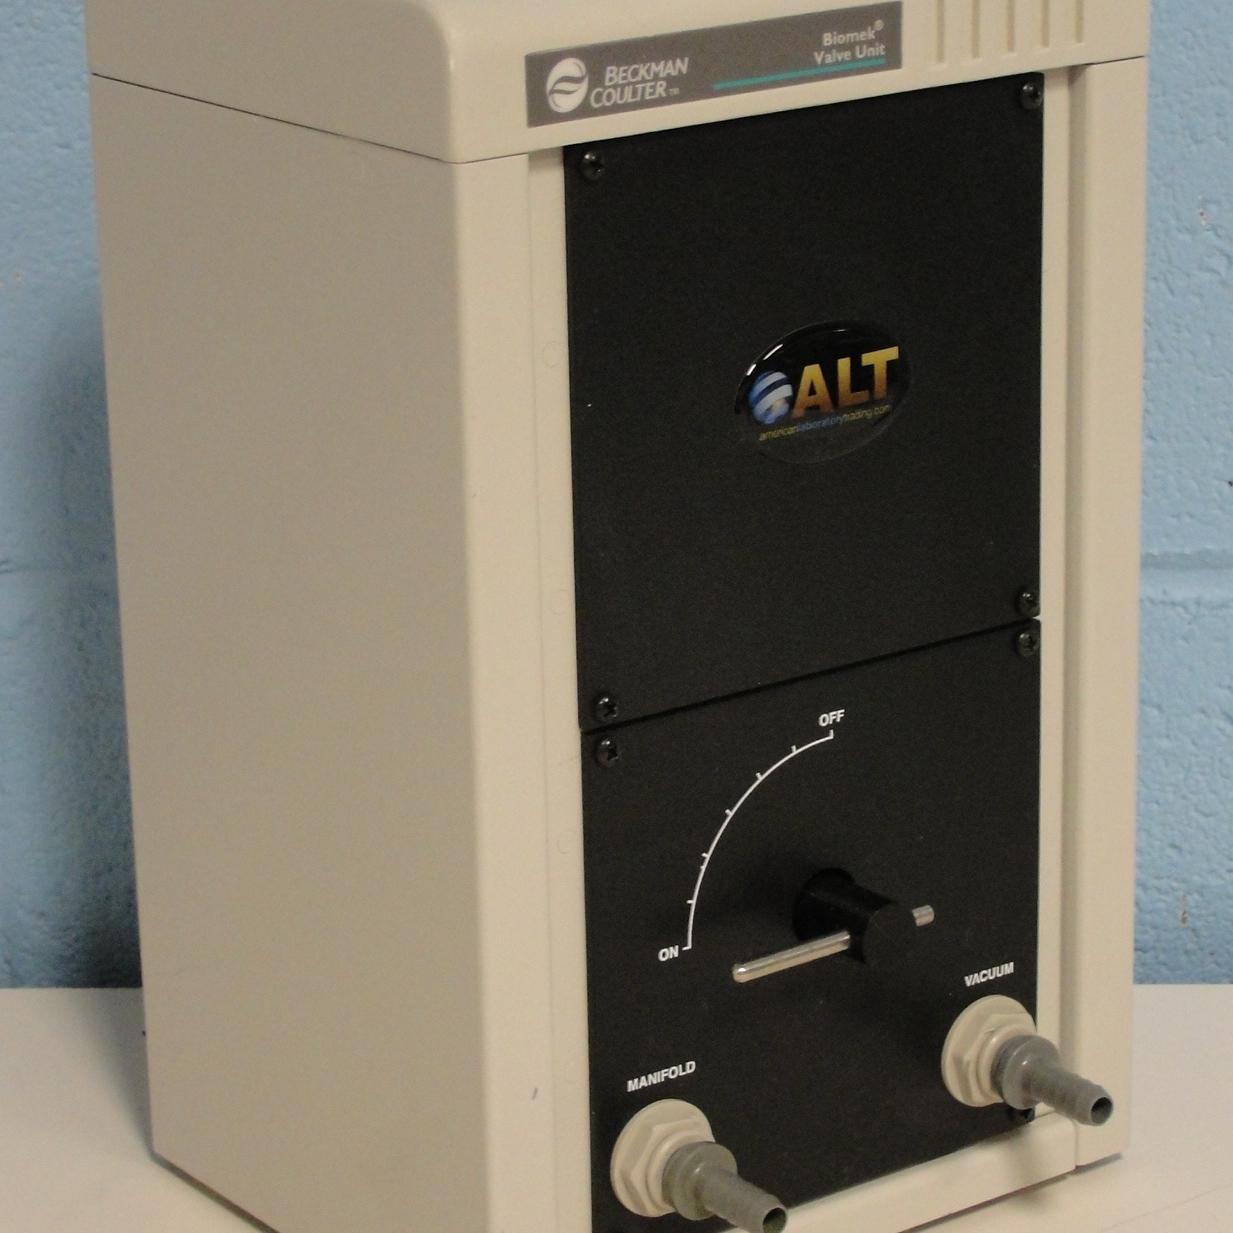 Beckman Coulter 609005 Biomek Vacuum Valve Unit Image